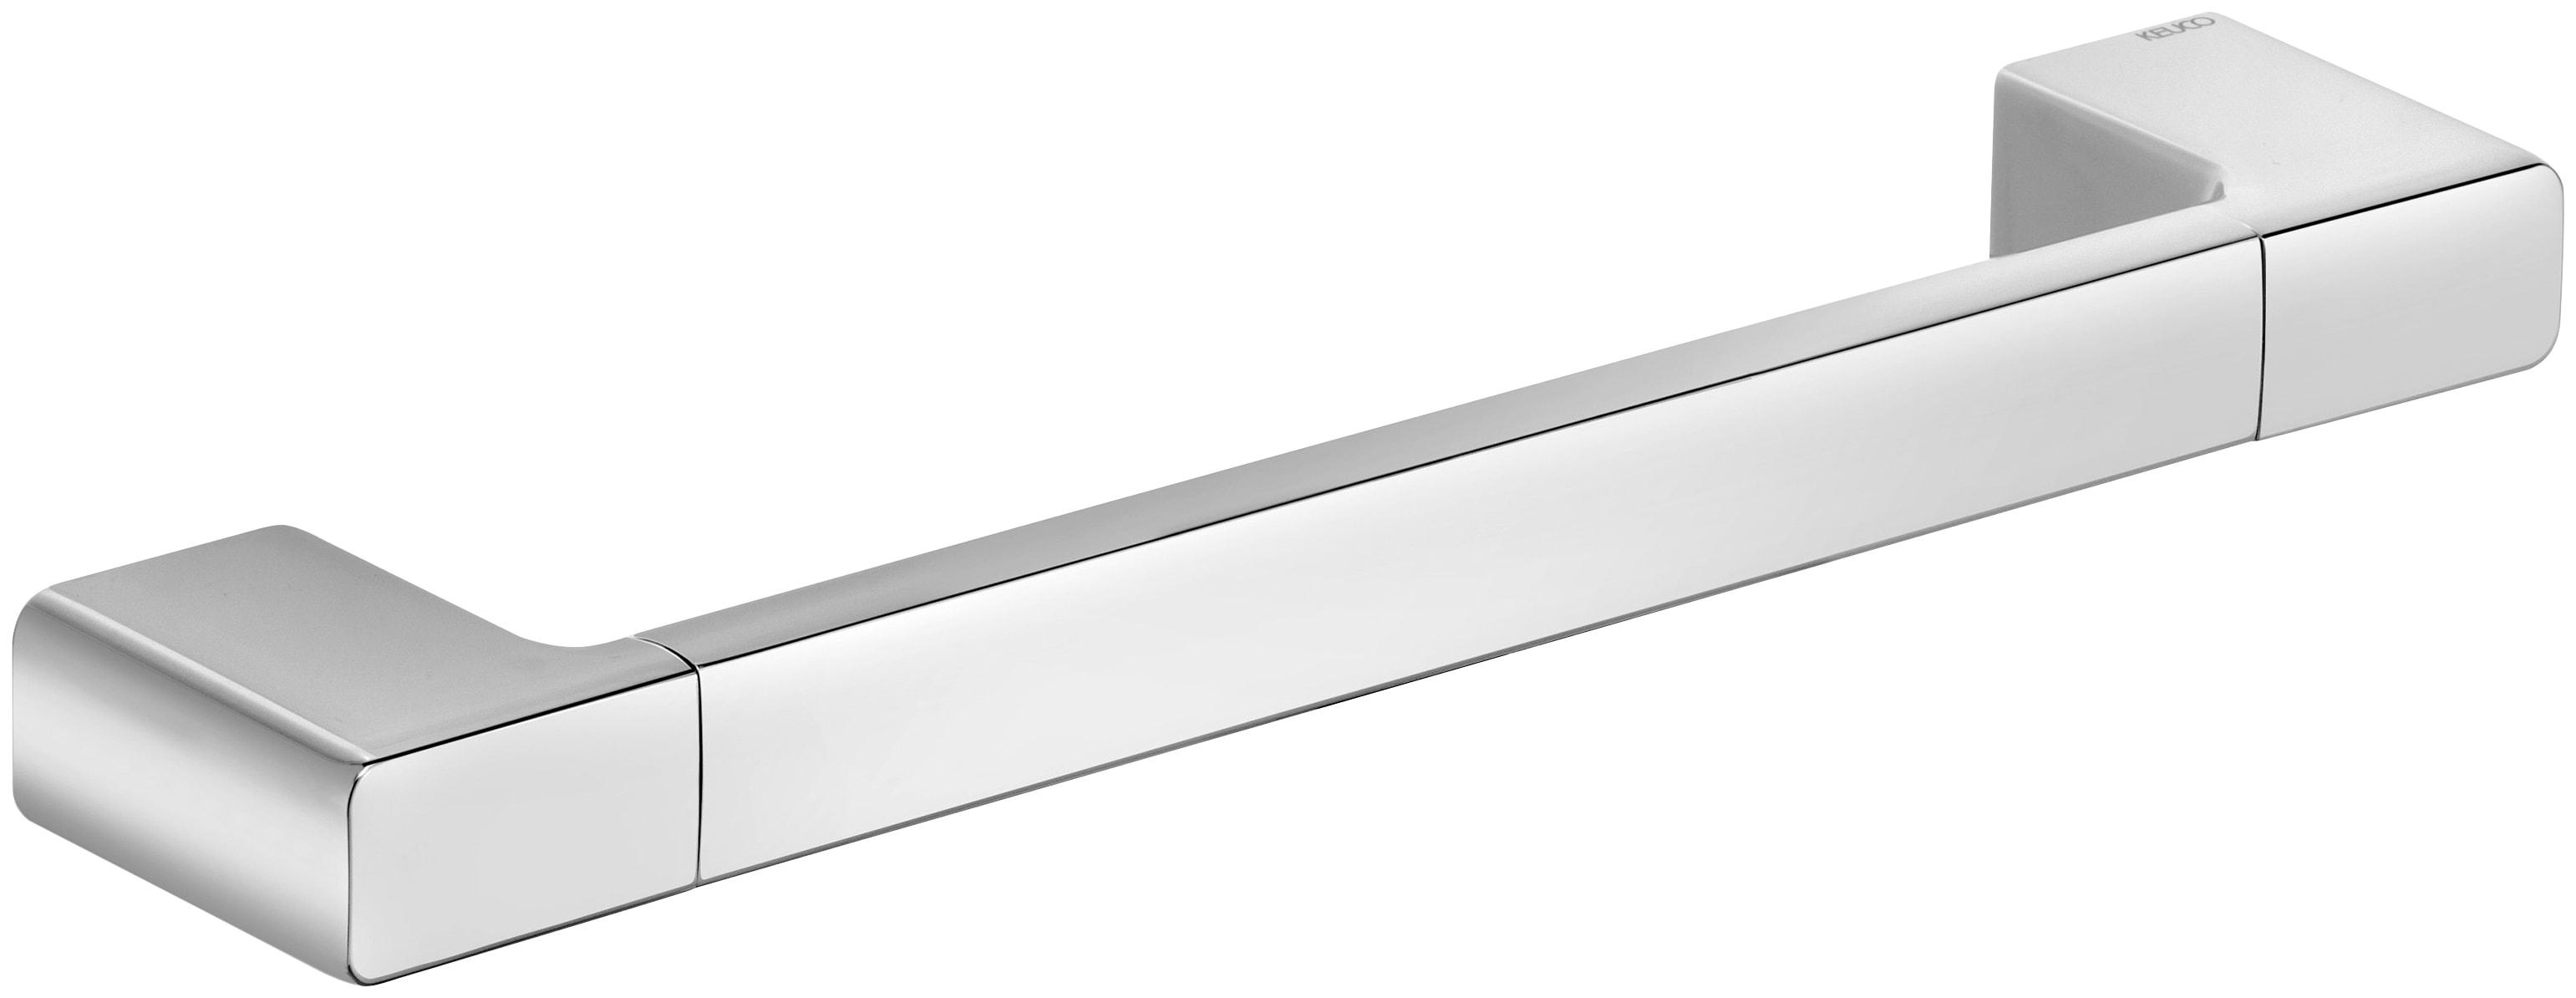 KEUCO Haltegriff »Collection Moll«, Breite: 300 mm, verchromt | Bad > Bad-Accessoires > Haltegriffe | Silberfarben | Metall | KEUCO